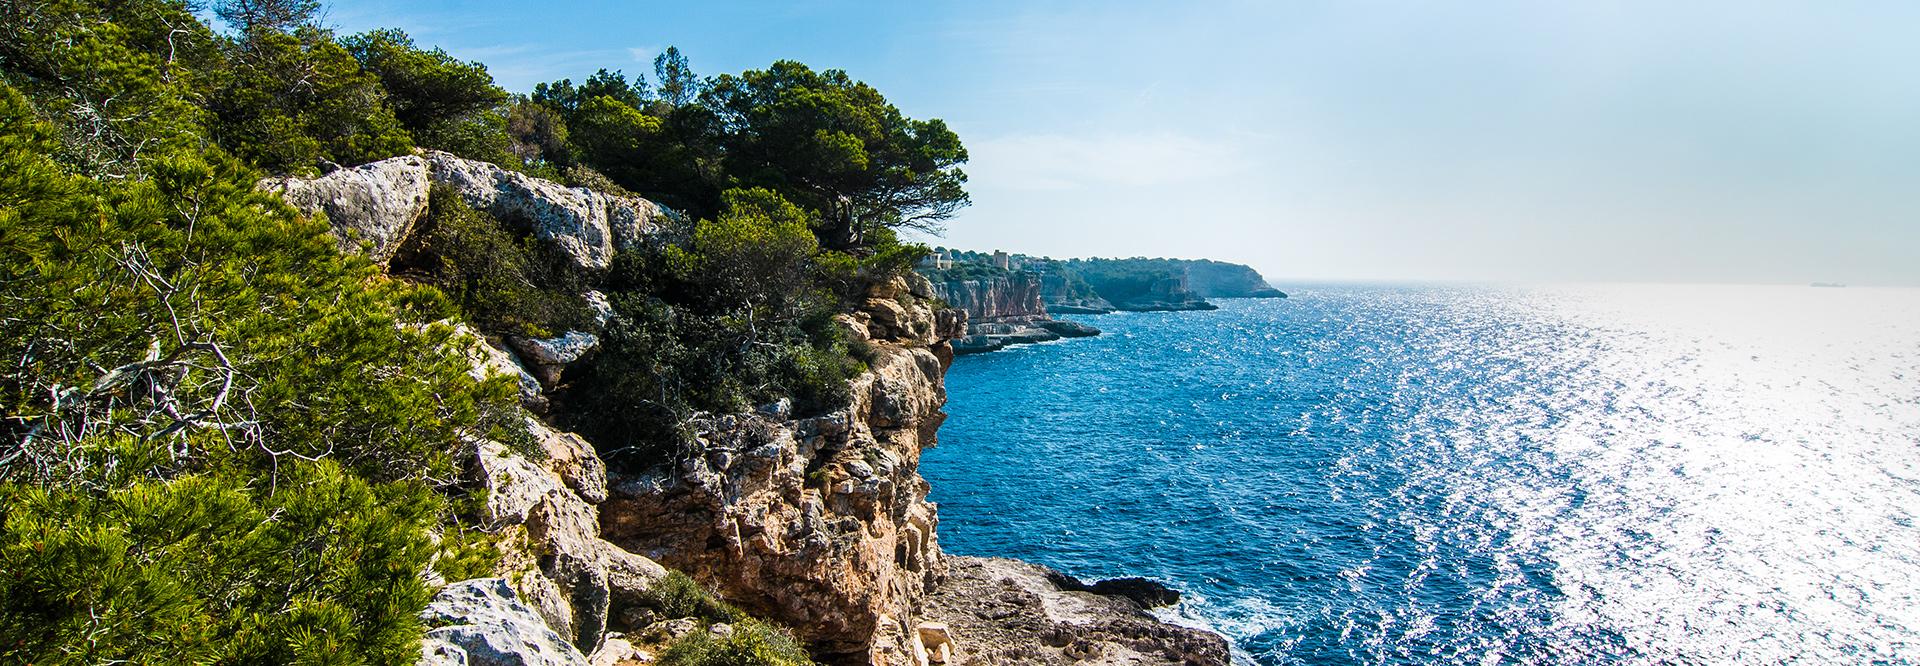 Yoga-Urlaub-Mallorca-s5